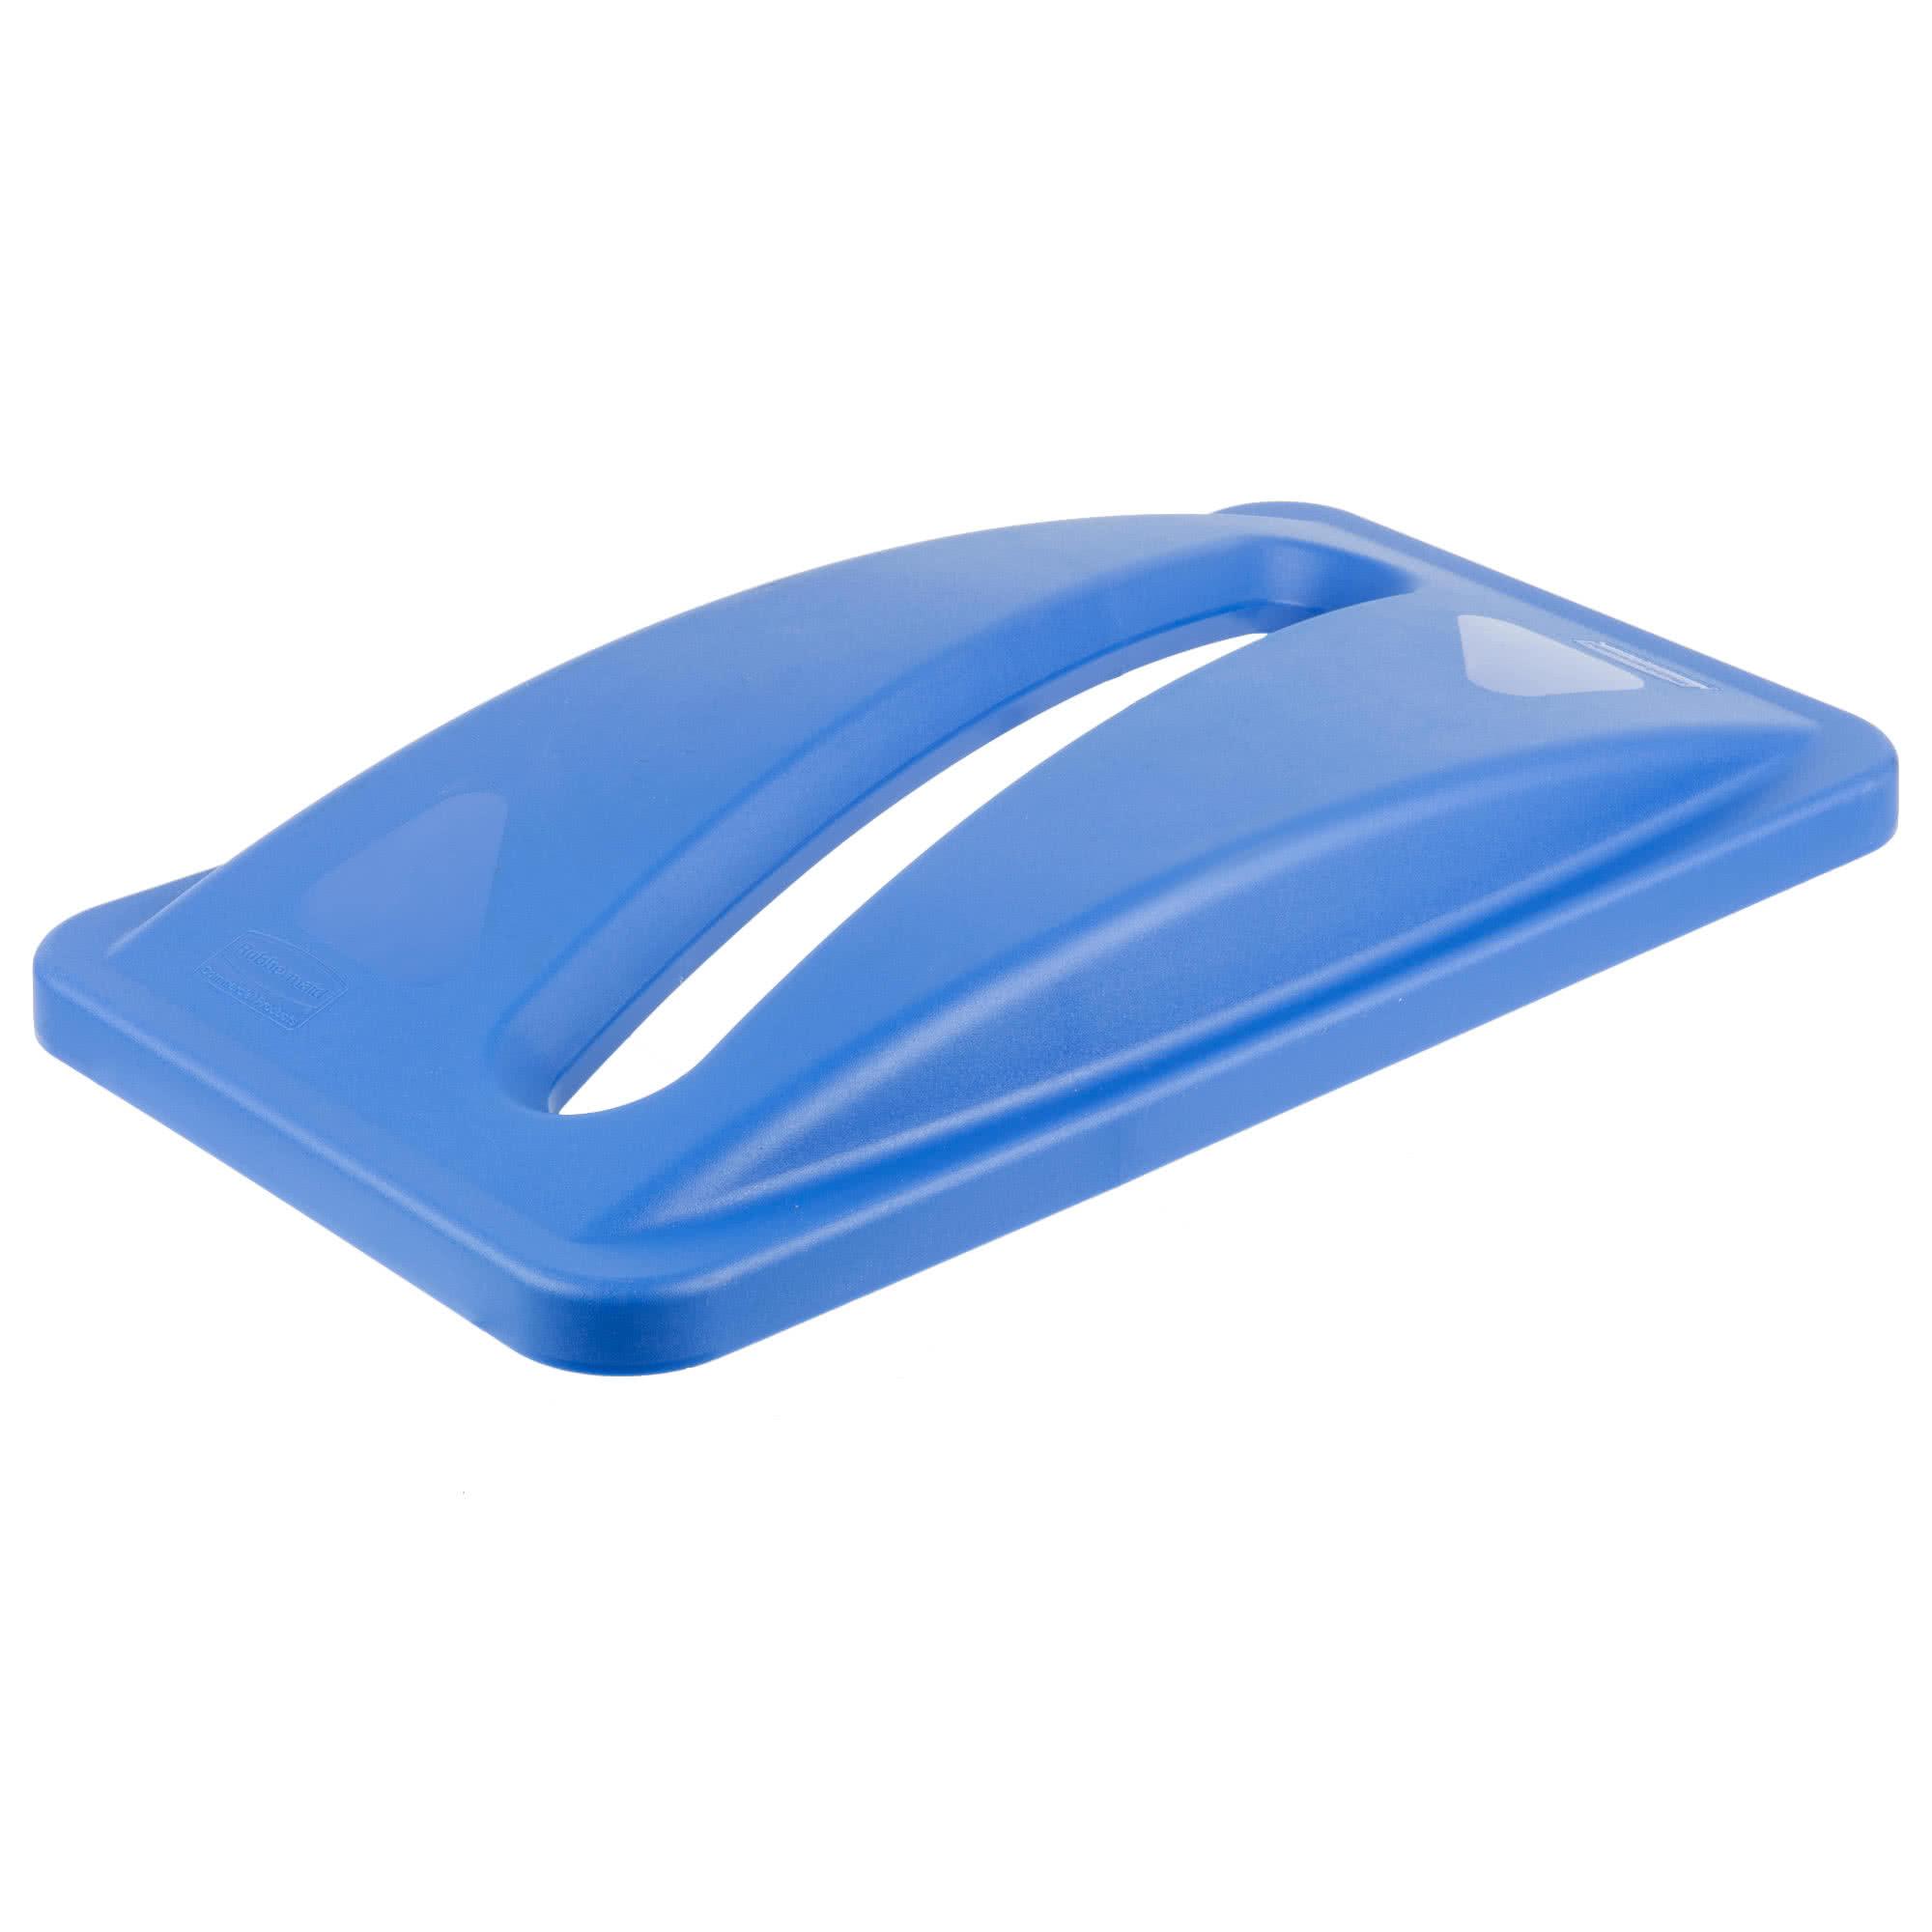 Rubbermaid FG270388BLUE tapa Slim-jim color azul para reciclaje de papel, aplican contenedores Slim-jim 2